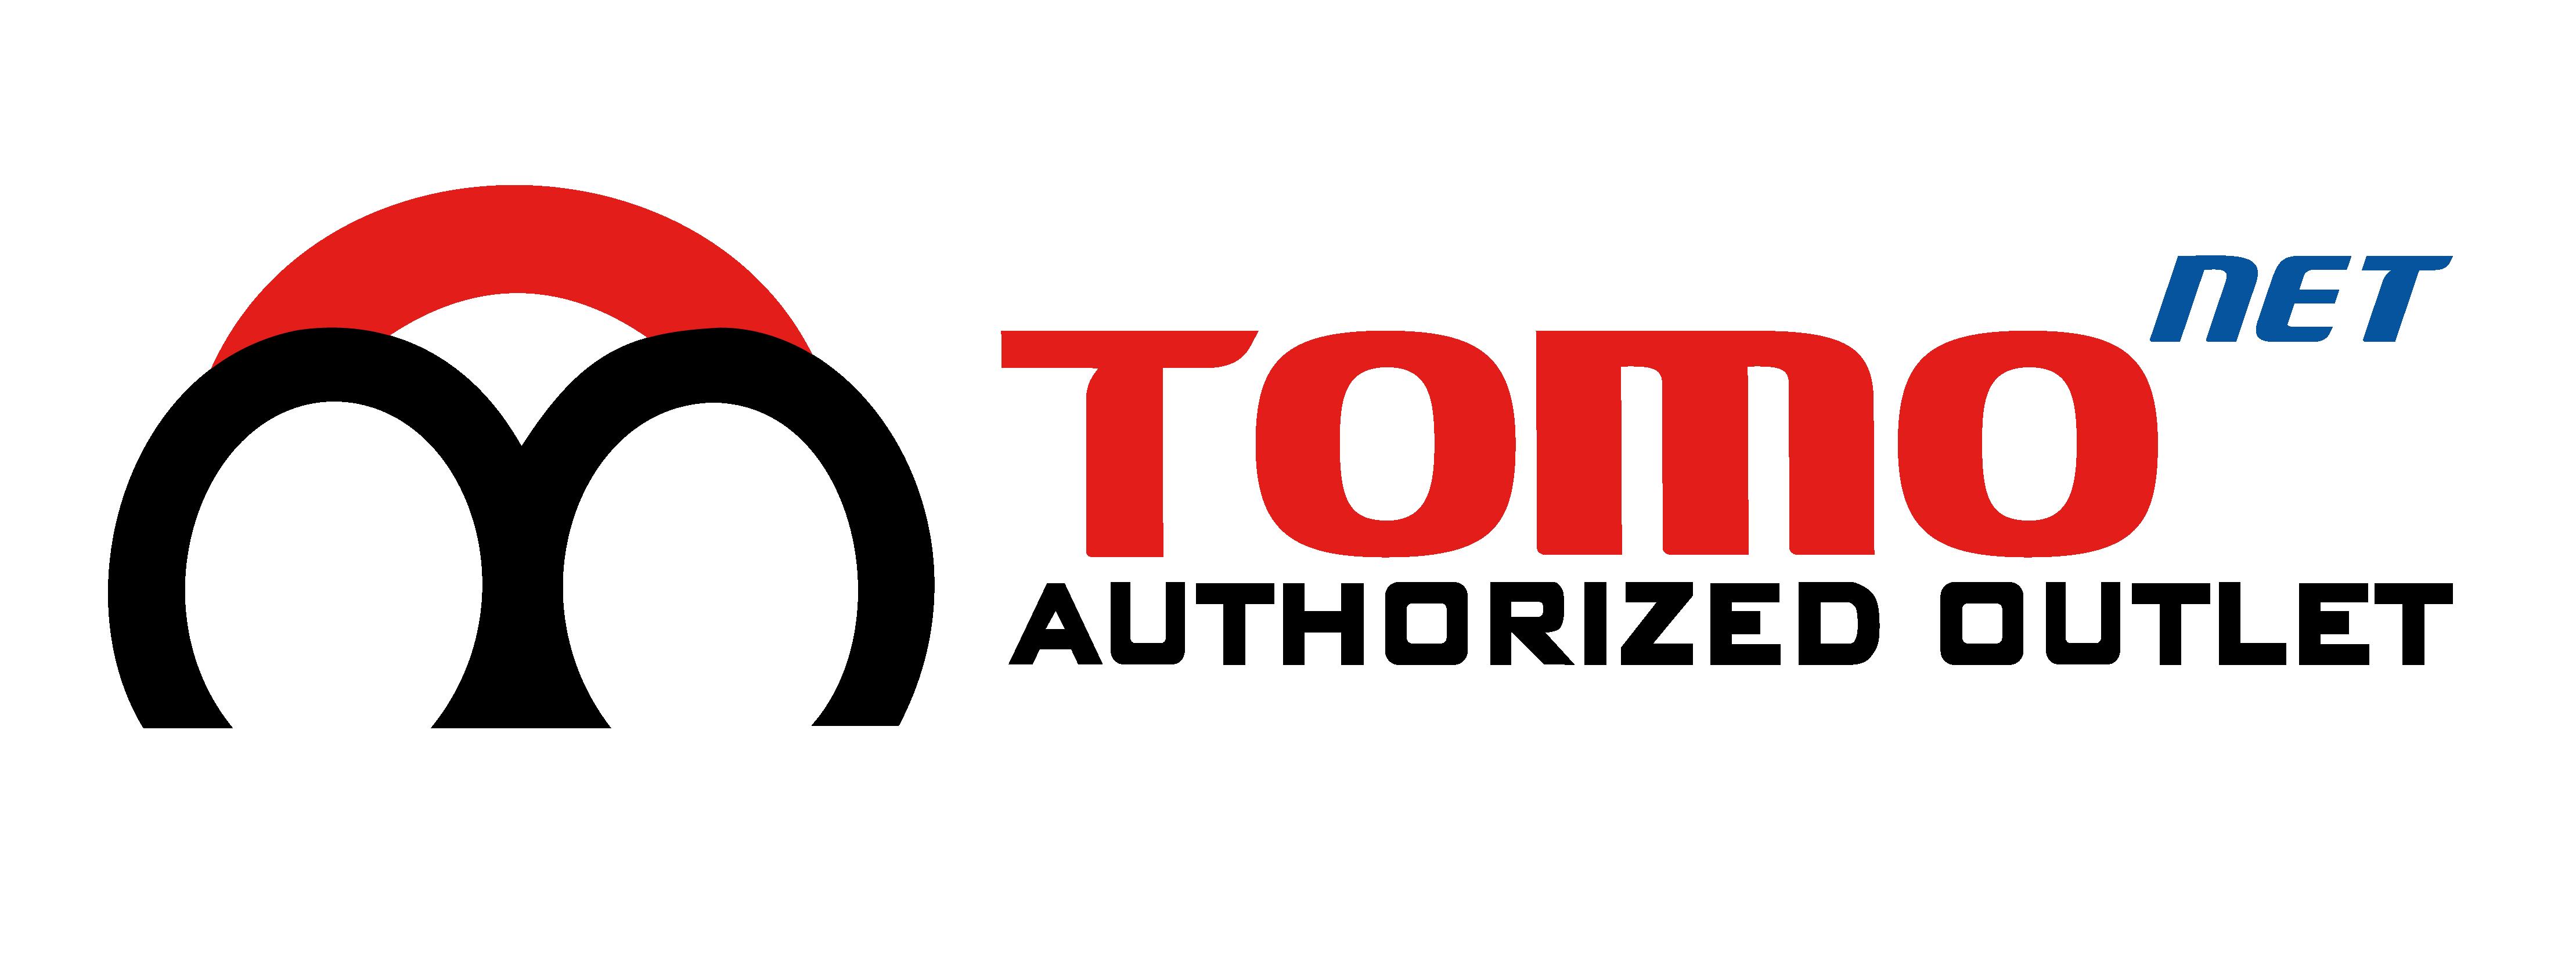 Car Suv Truck Commercial Motorcycle Tyres Bridgestone Ban Mobil Techno Sport 195 50 R16 Vocer Mau Beli Online Langsung Aja Klik Tomonetcoid